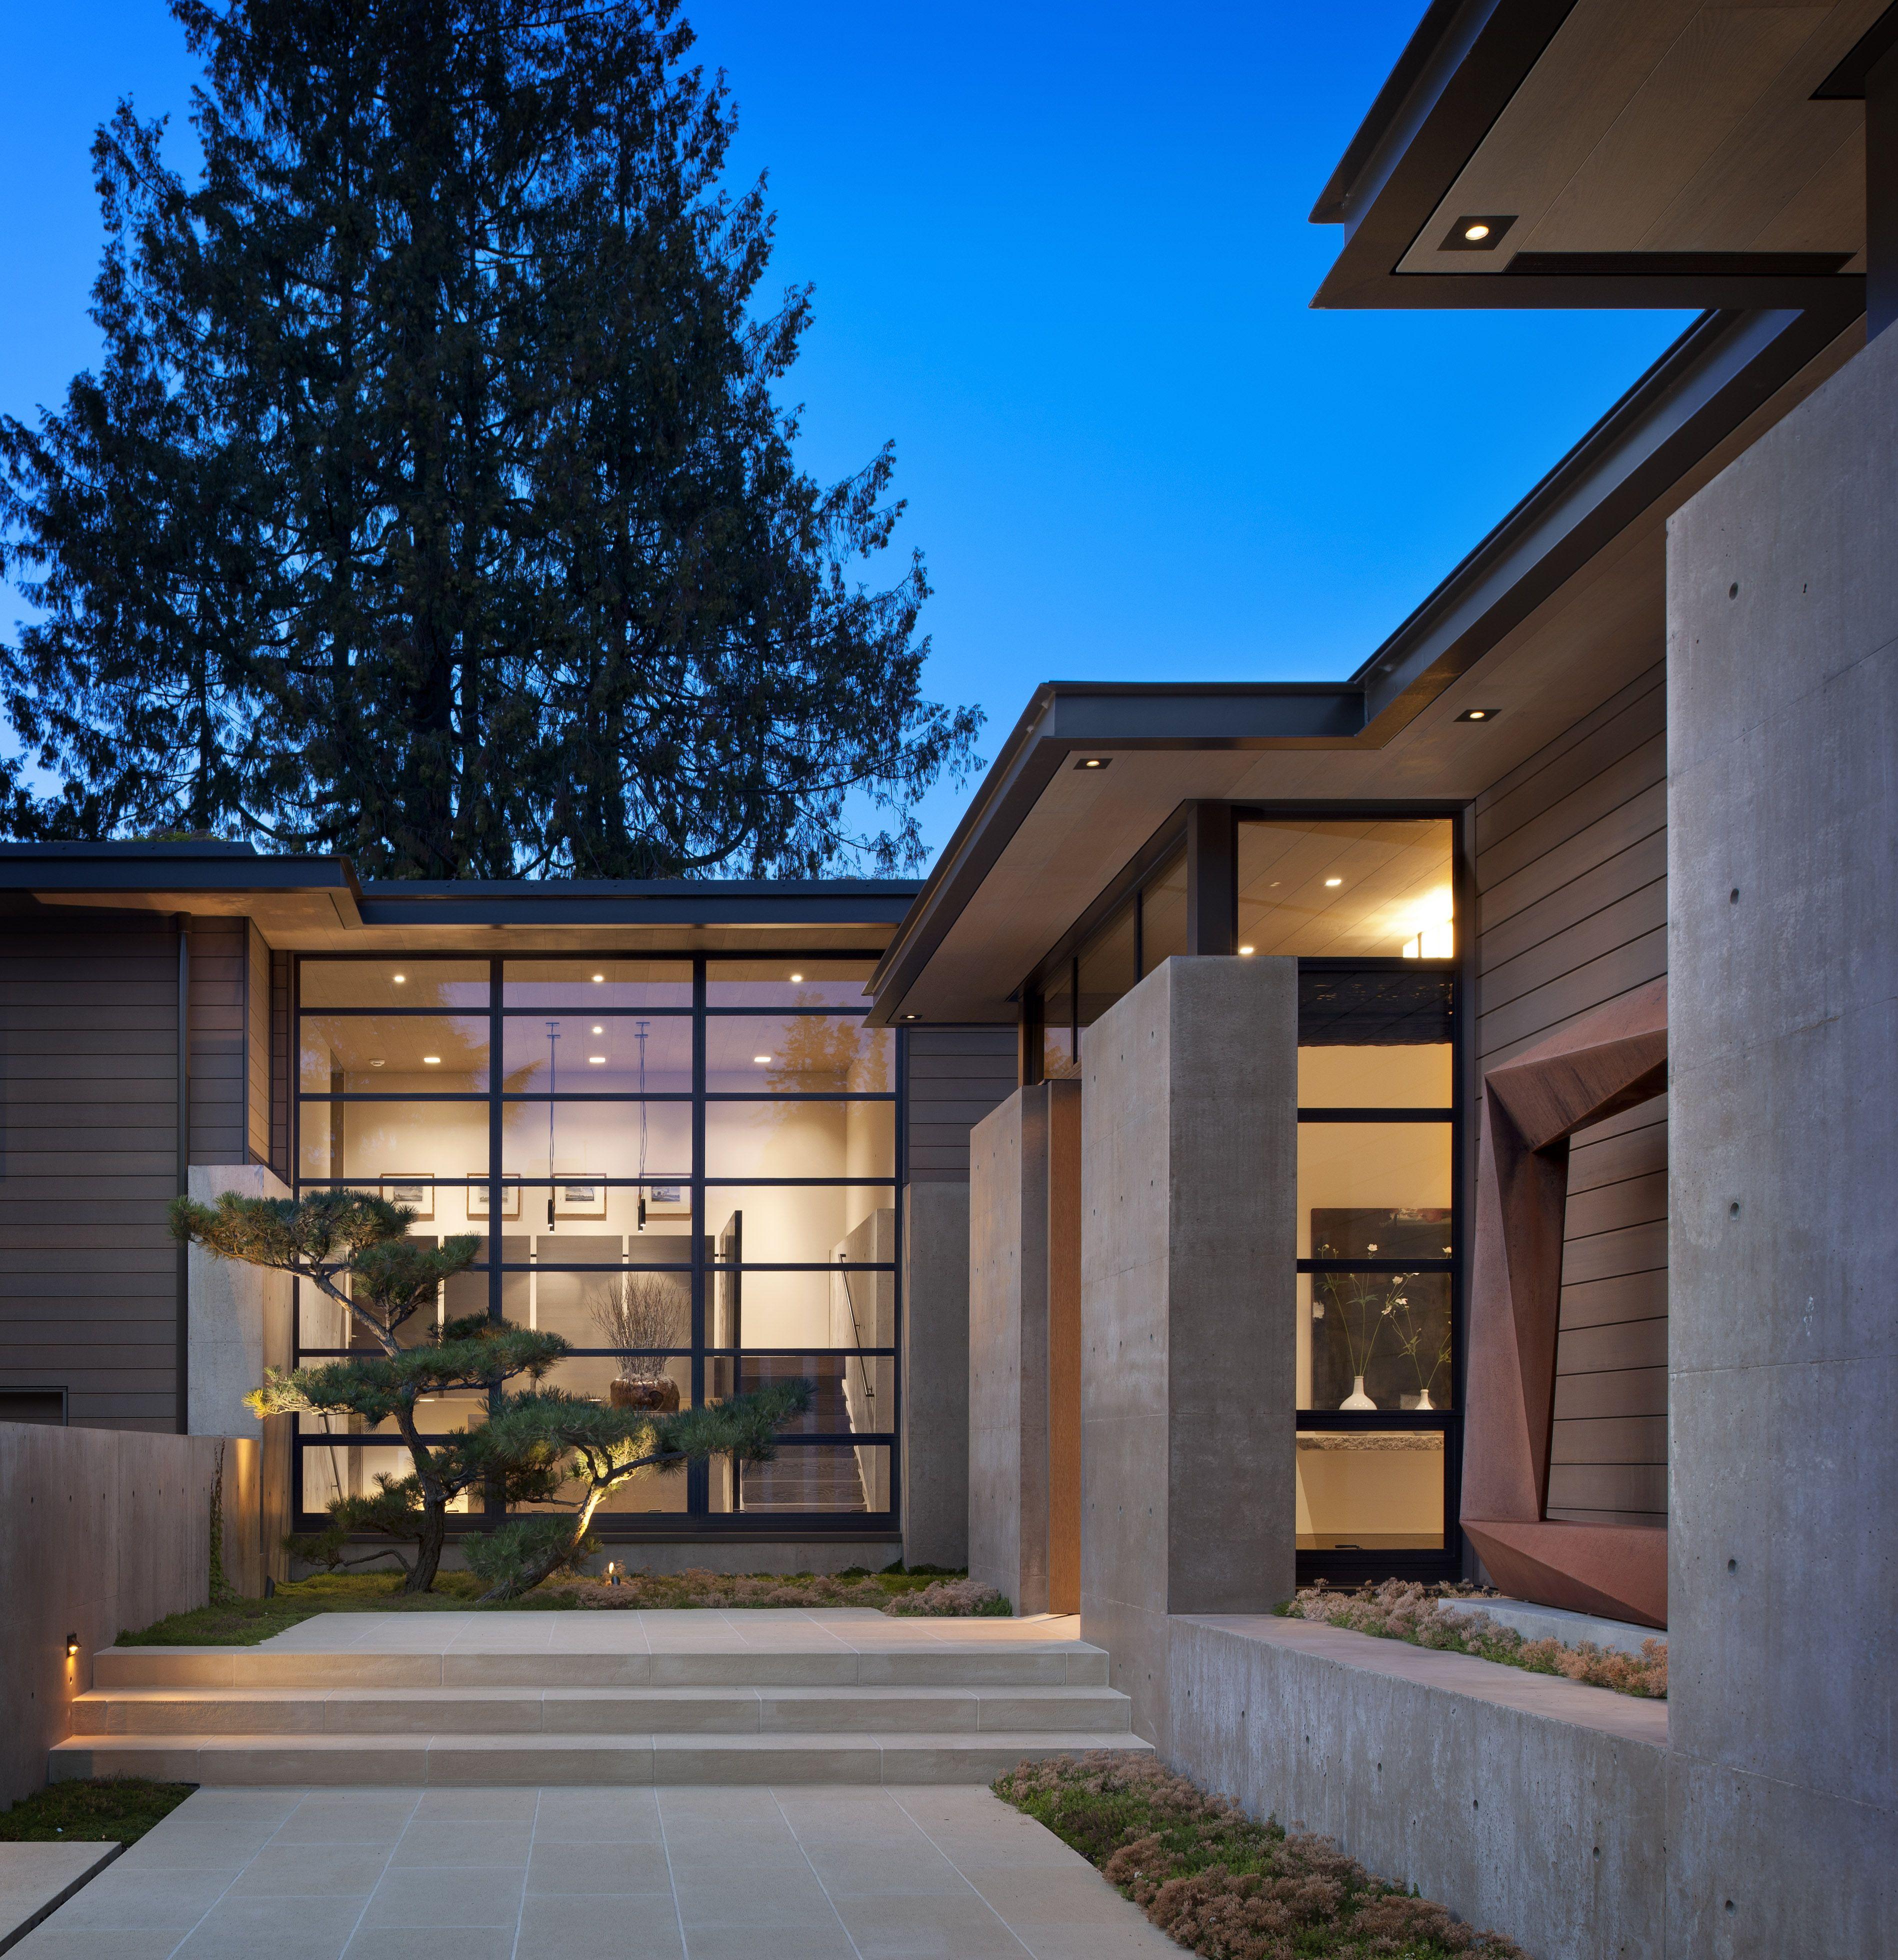 Washington park residence conard romano architects a - Architecture contemporaine residence parks ...